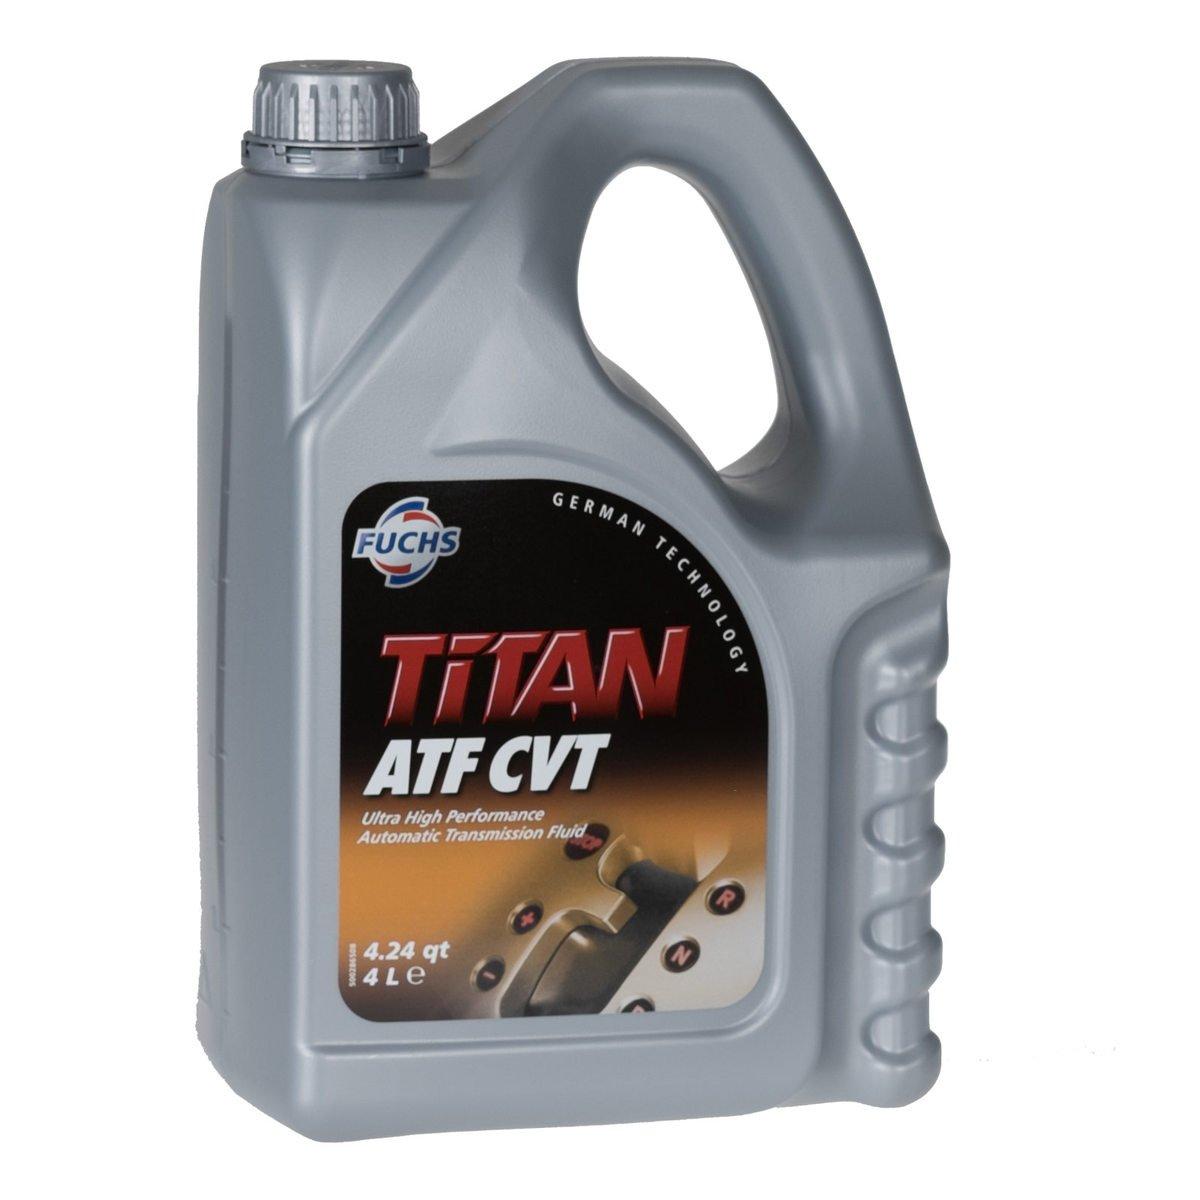 FUCHS Motor oil Automatic oil Automatic transmission oil ATF CVT 135 3 oz Ishak Kilic - Oil Drop - Dropship